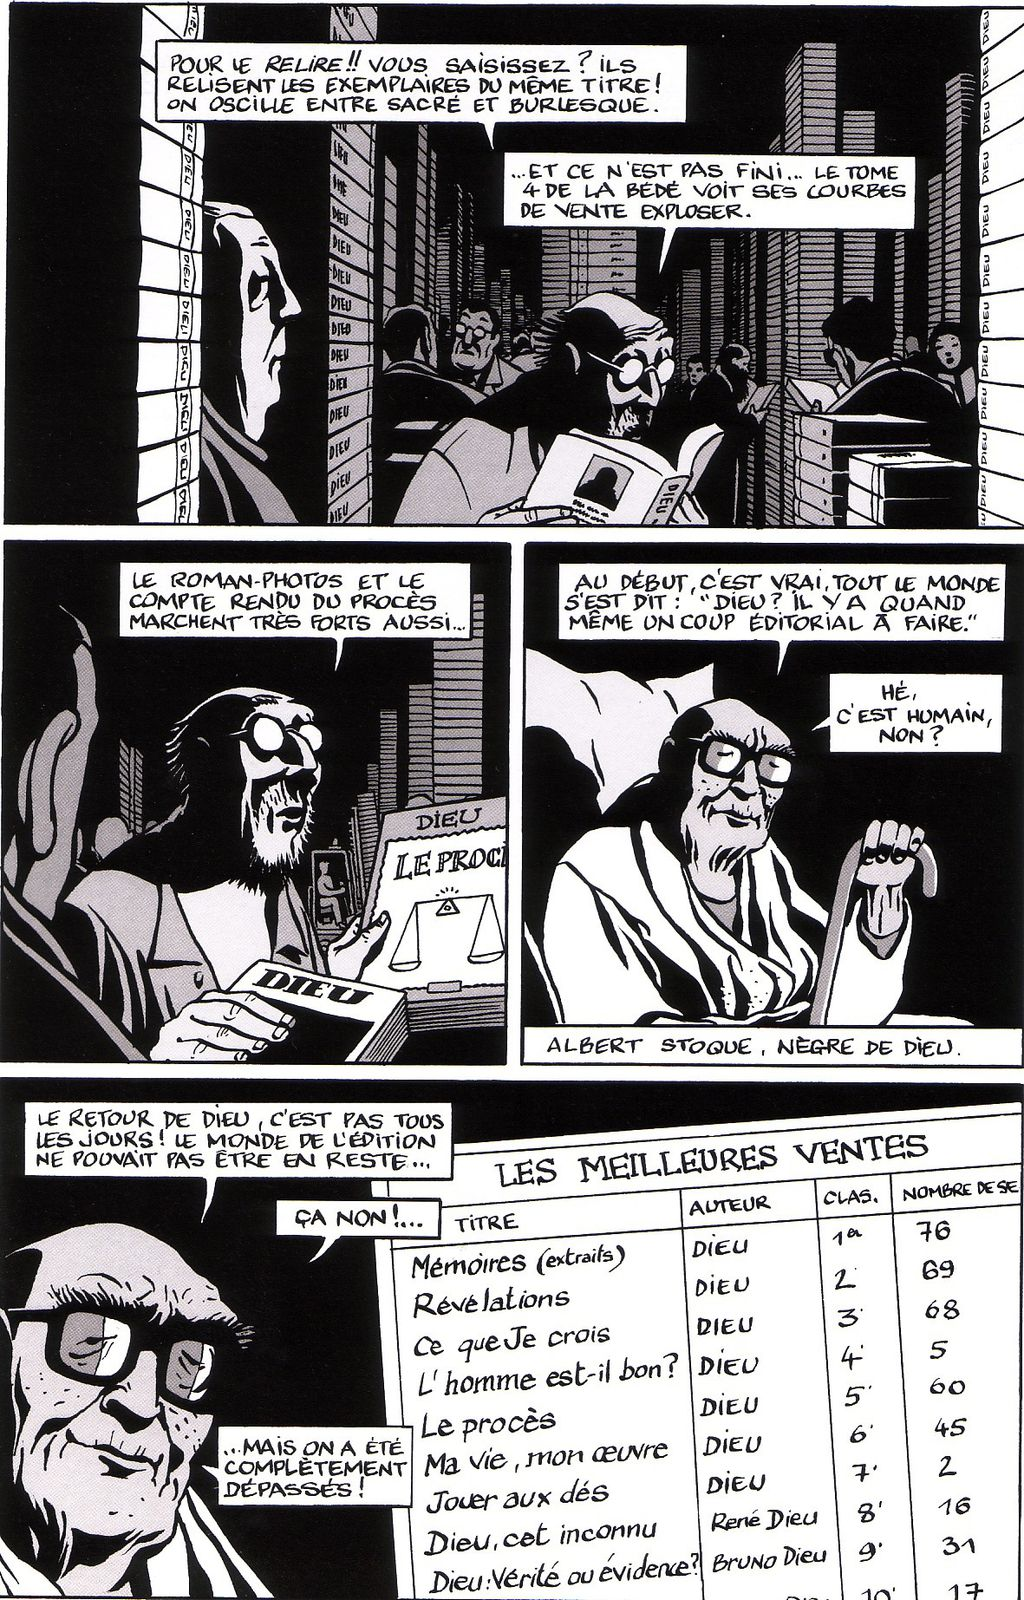 J'aime la synergie spirituelle - Page 3 Dieu_e11